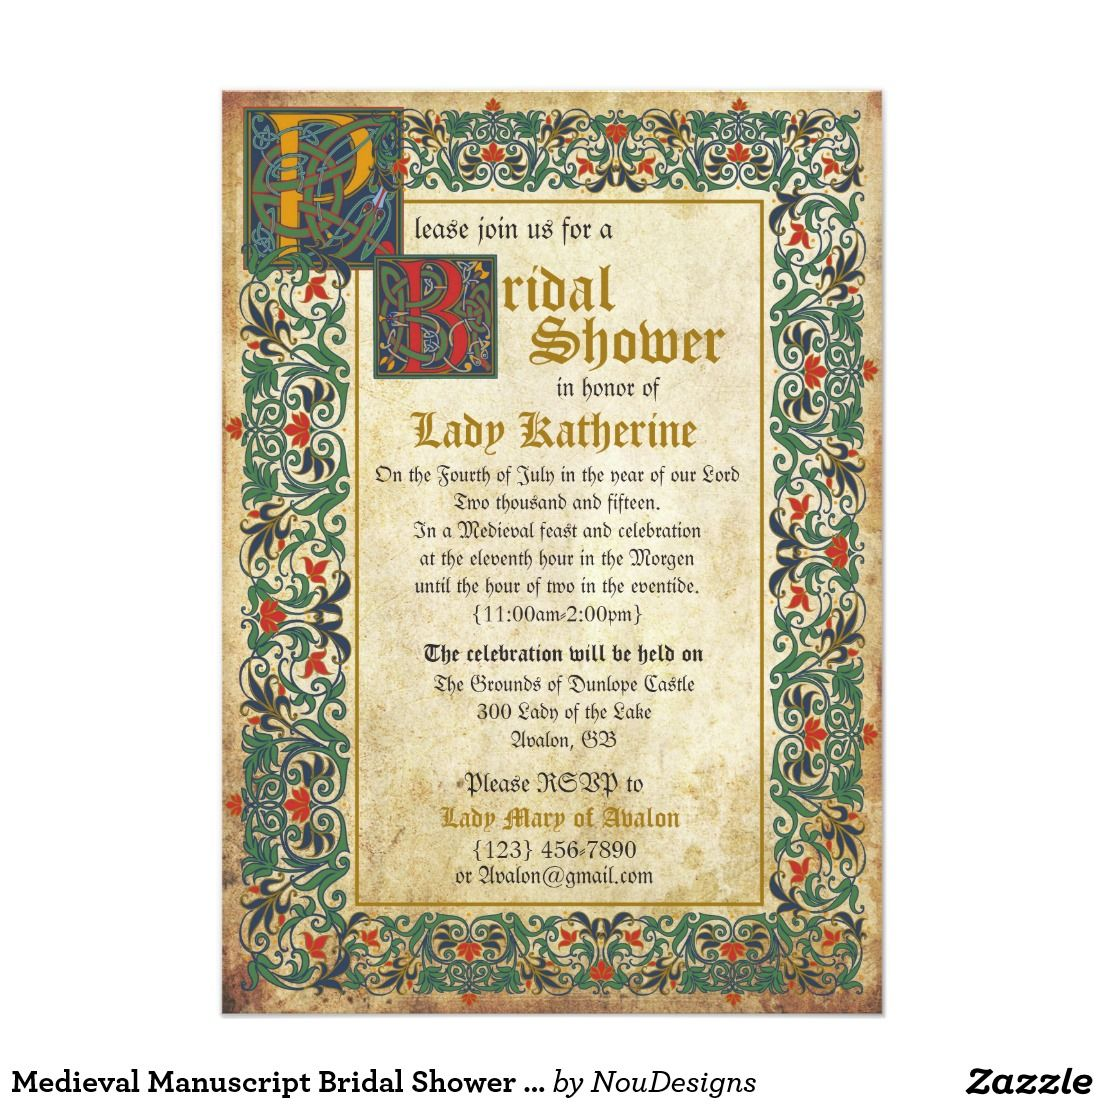 28 Best Medieval Wedding Invitations Images On Pinterest: Medieval Manuscript Bridal Shower Invitation Card